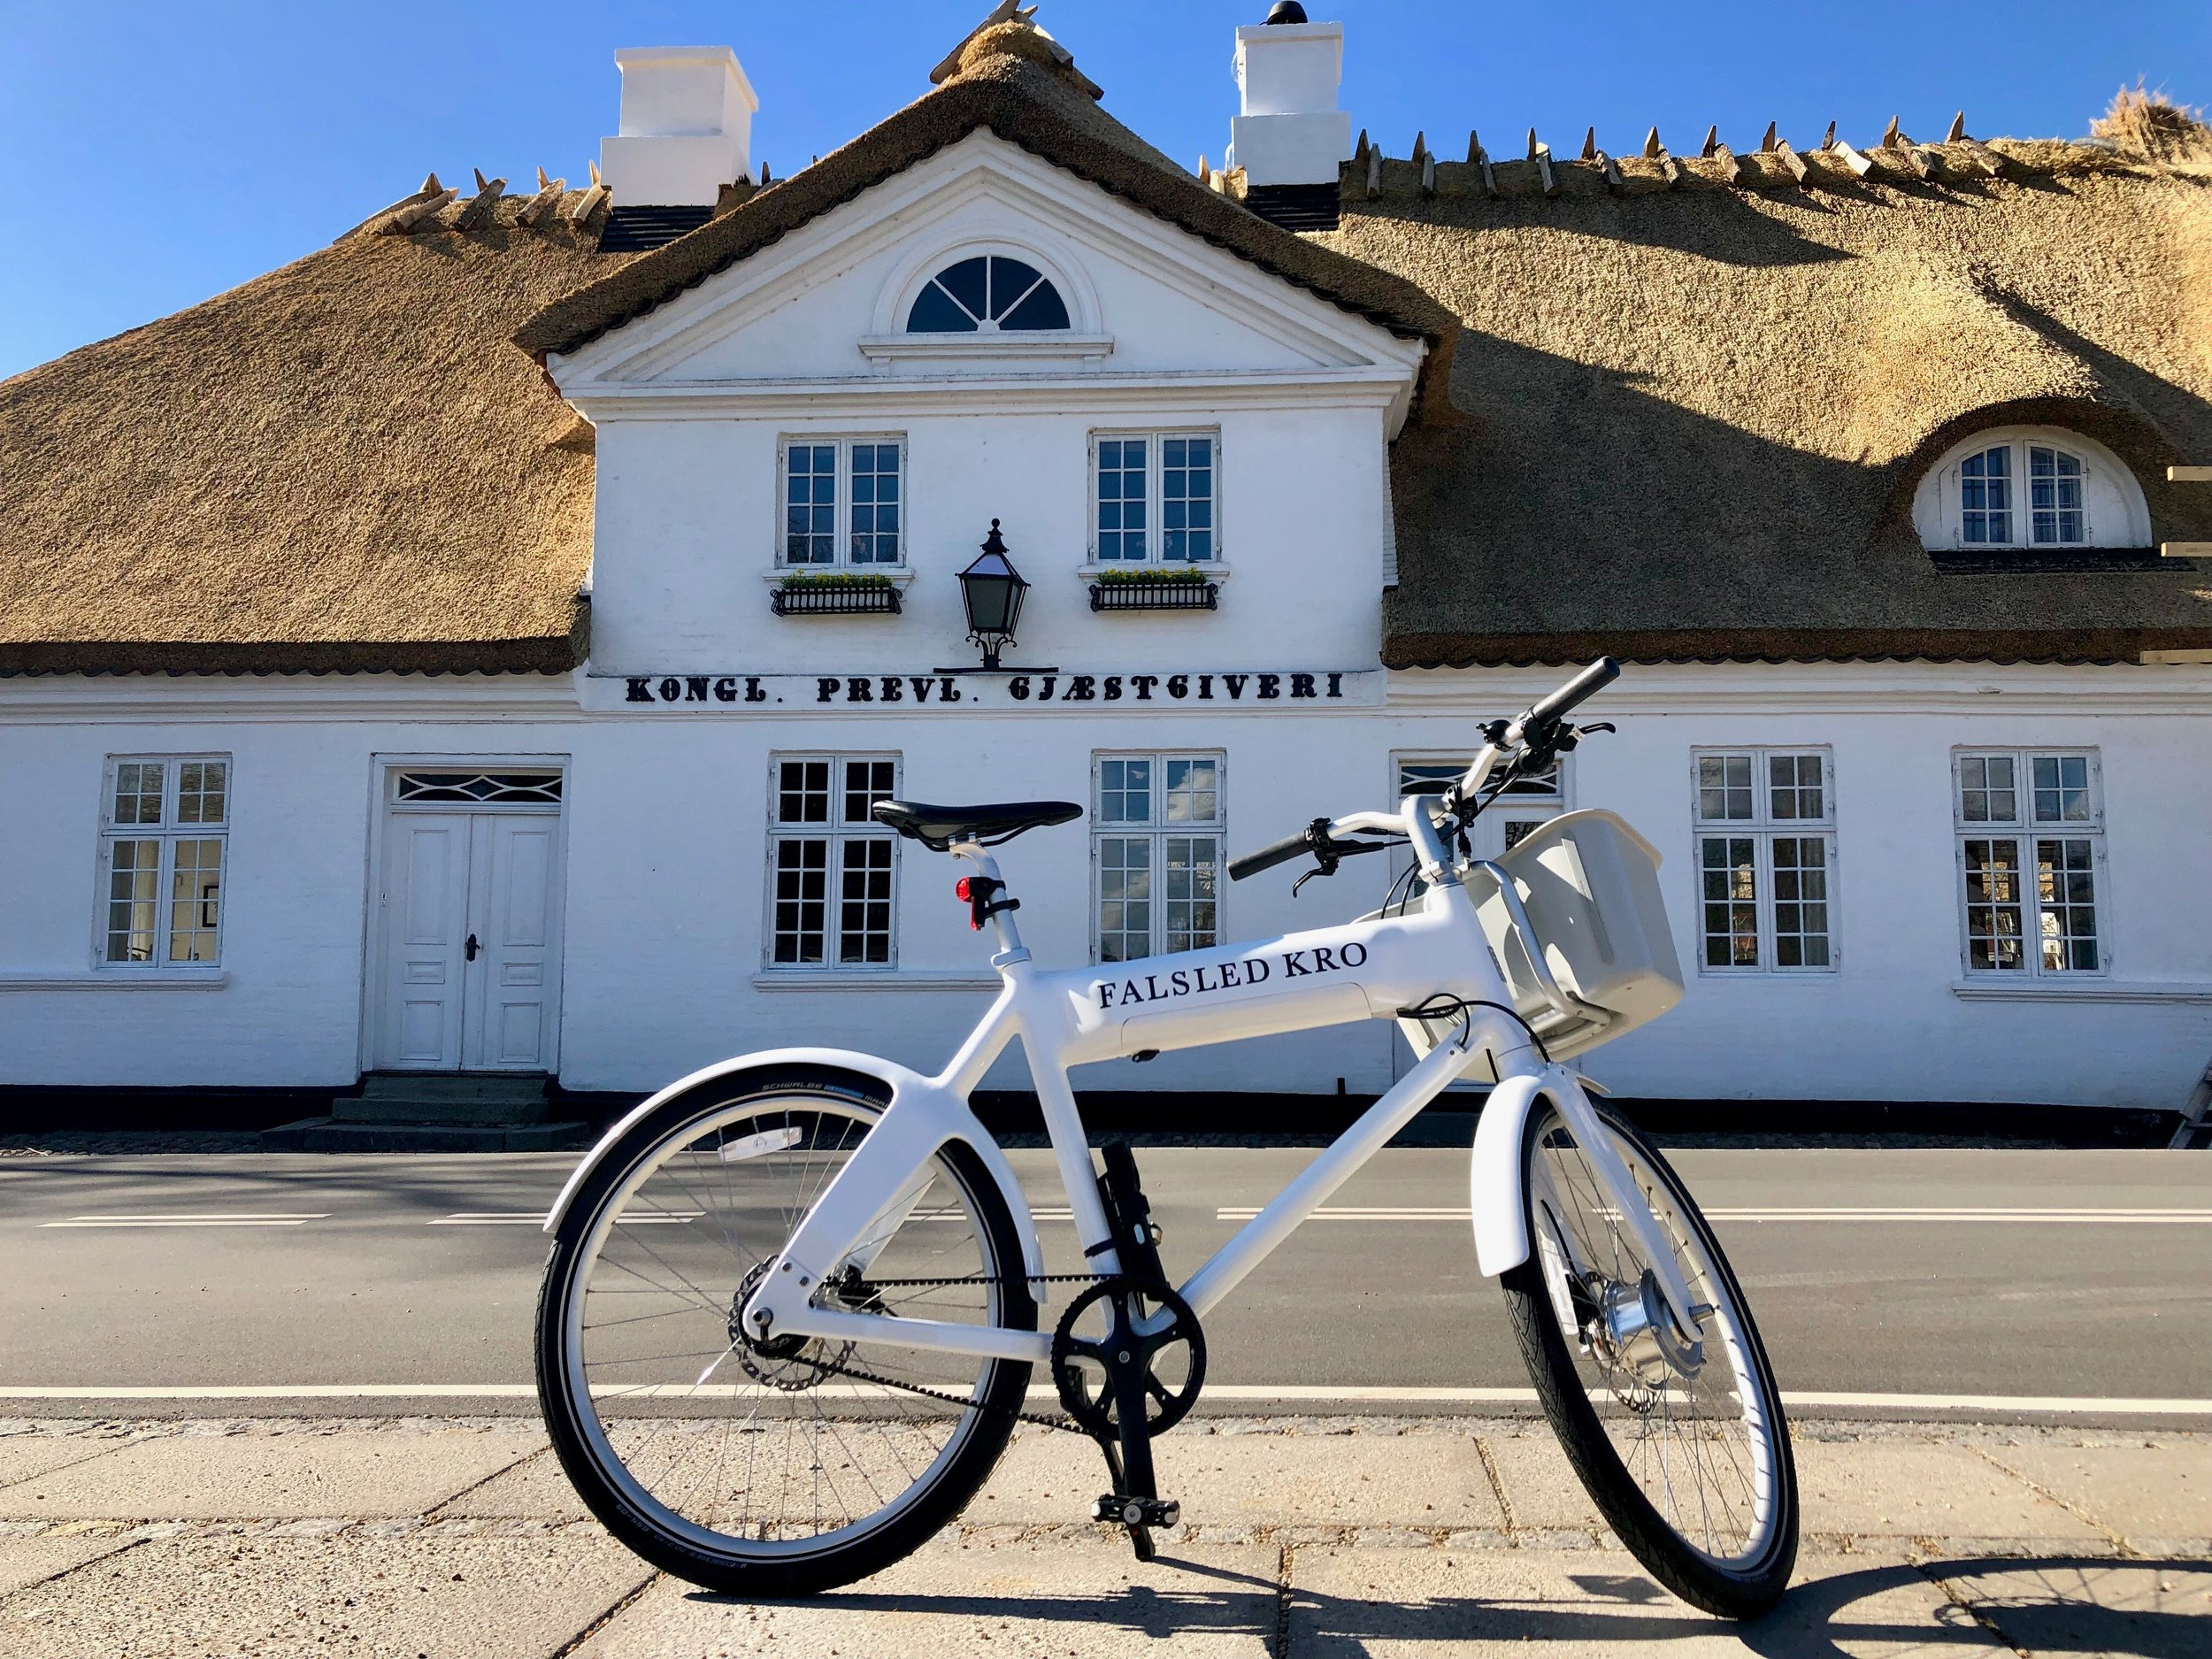 Cykel foran kroen.jpg